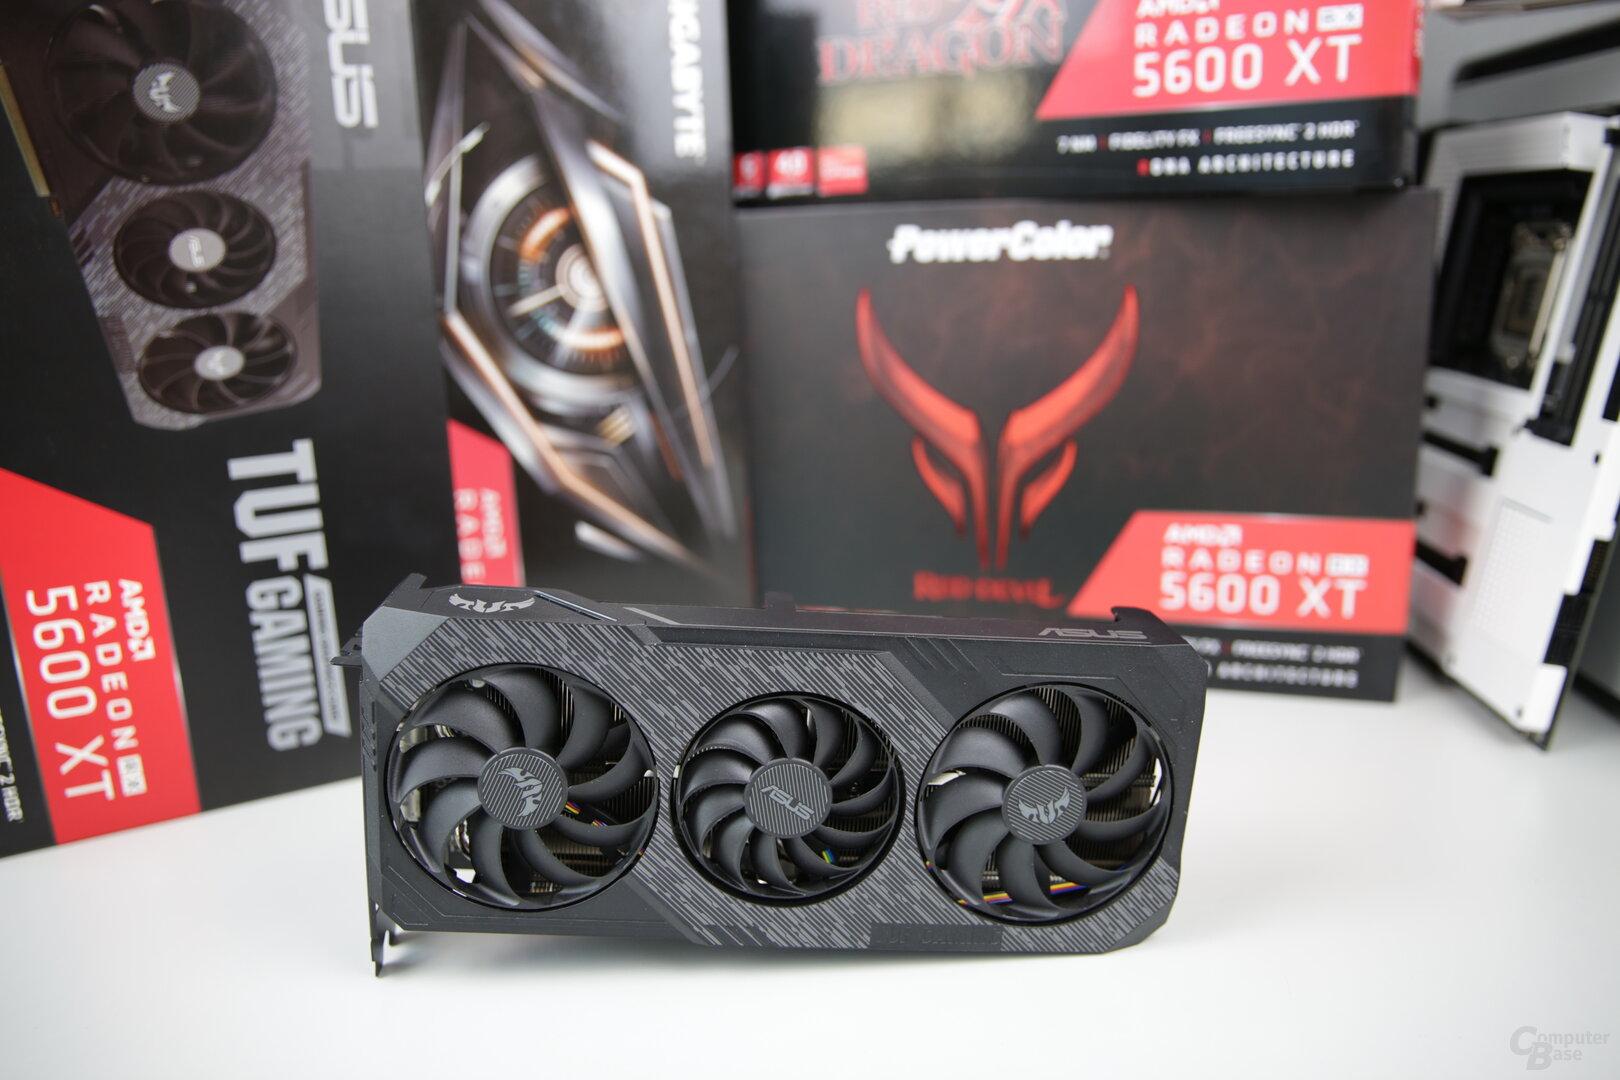 Asus Radeon RX 5600 XT TUF Evo OC